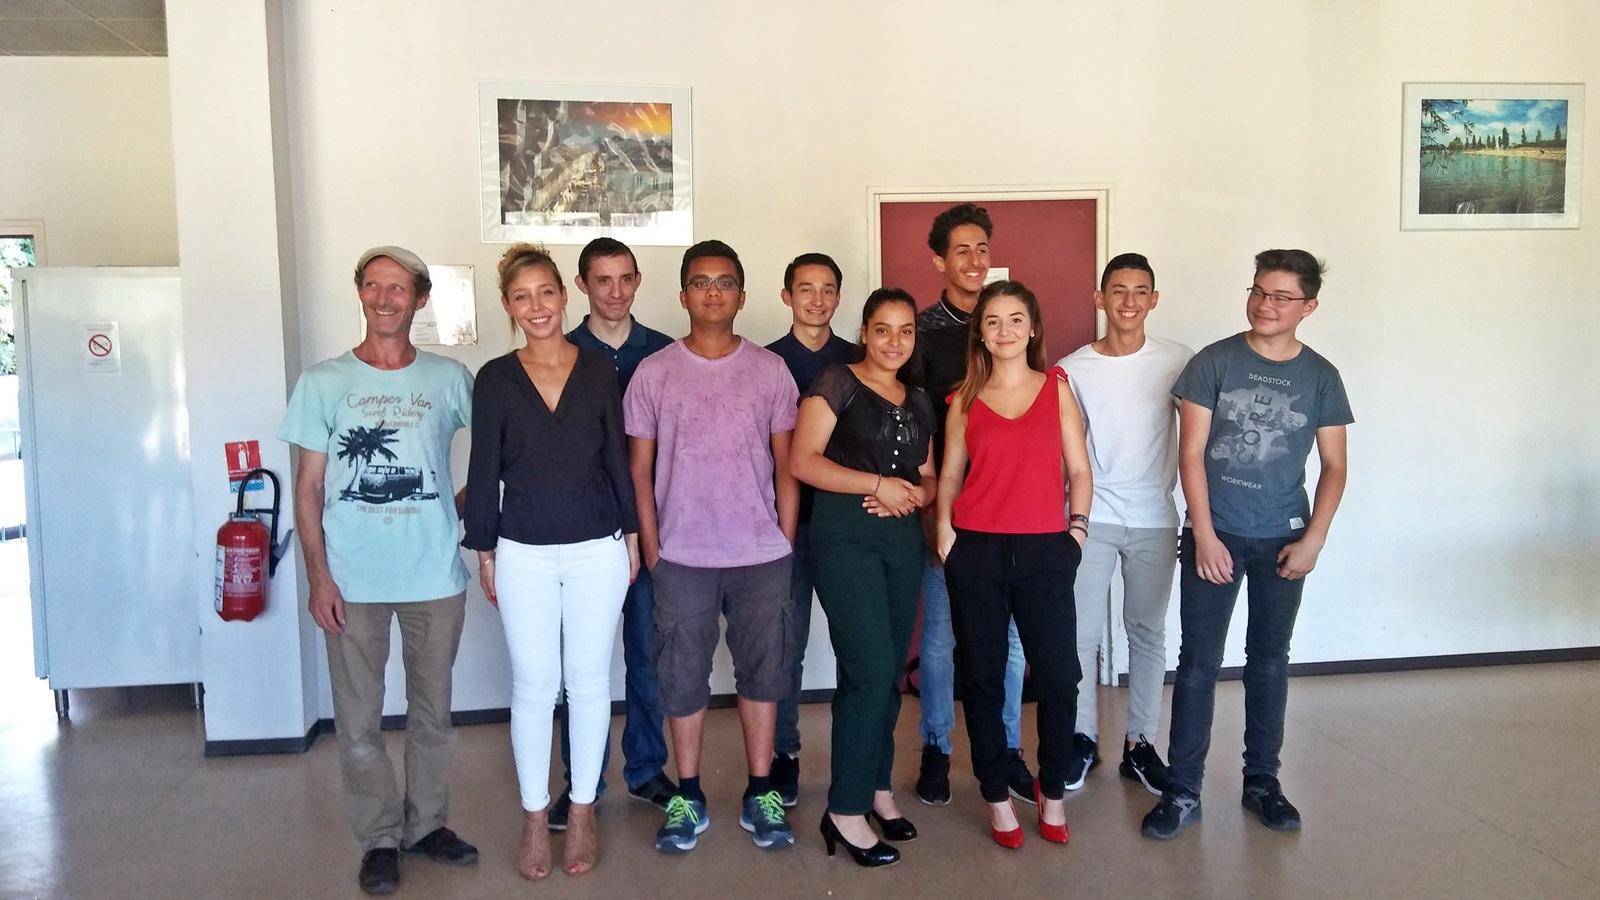 Boss'N Coop: expérience positive à Manosque